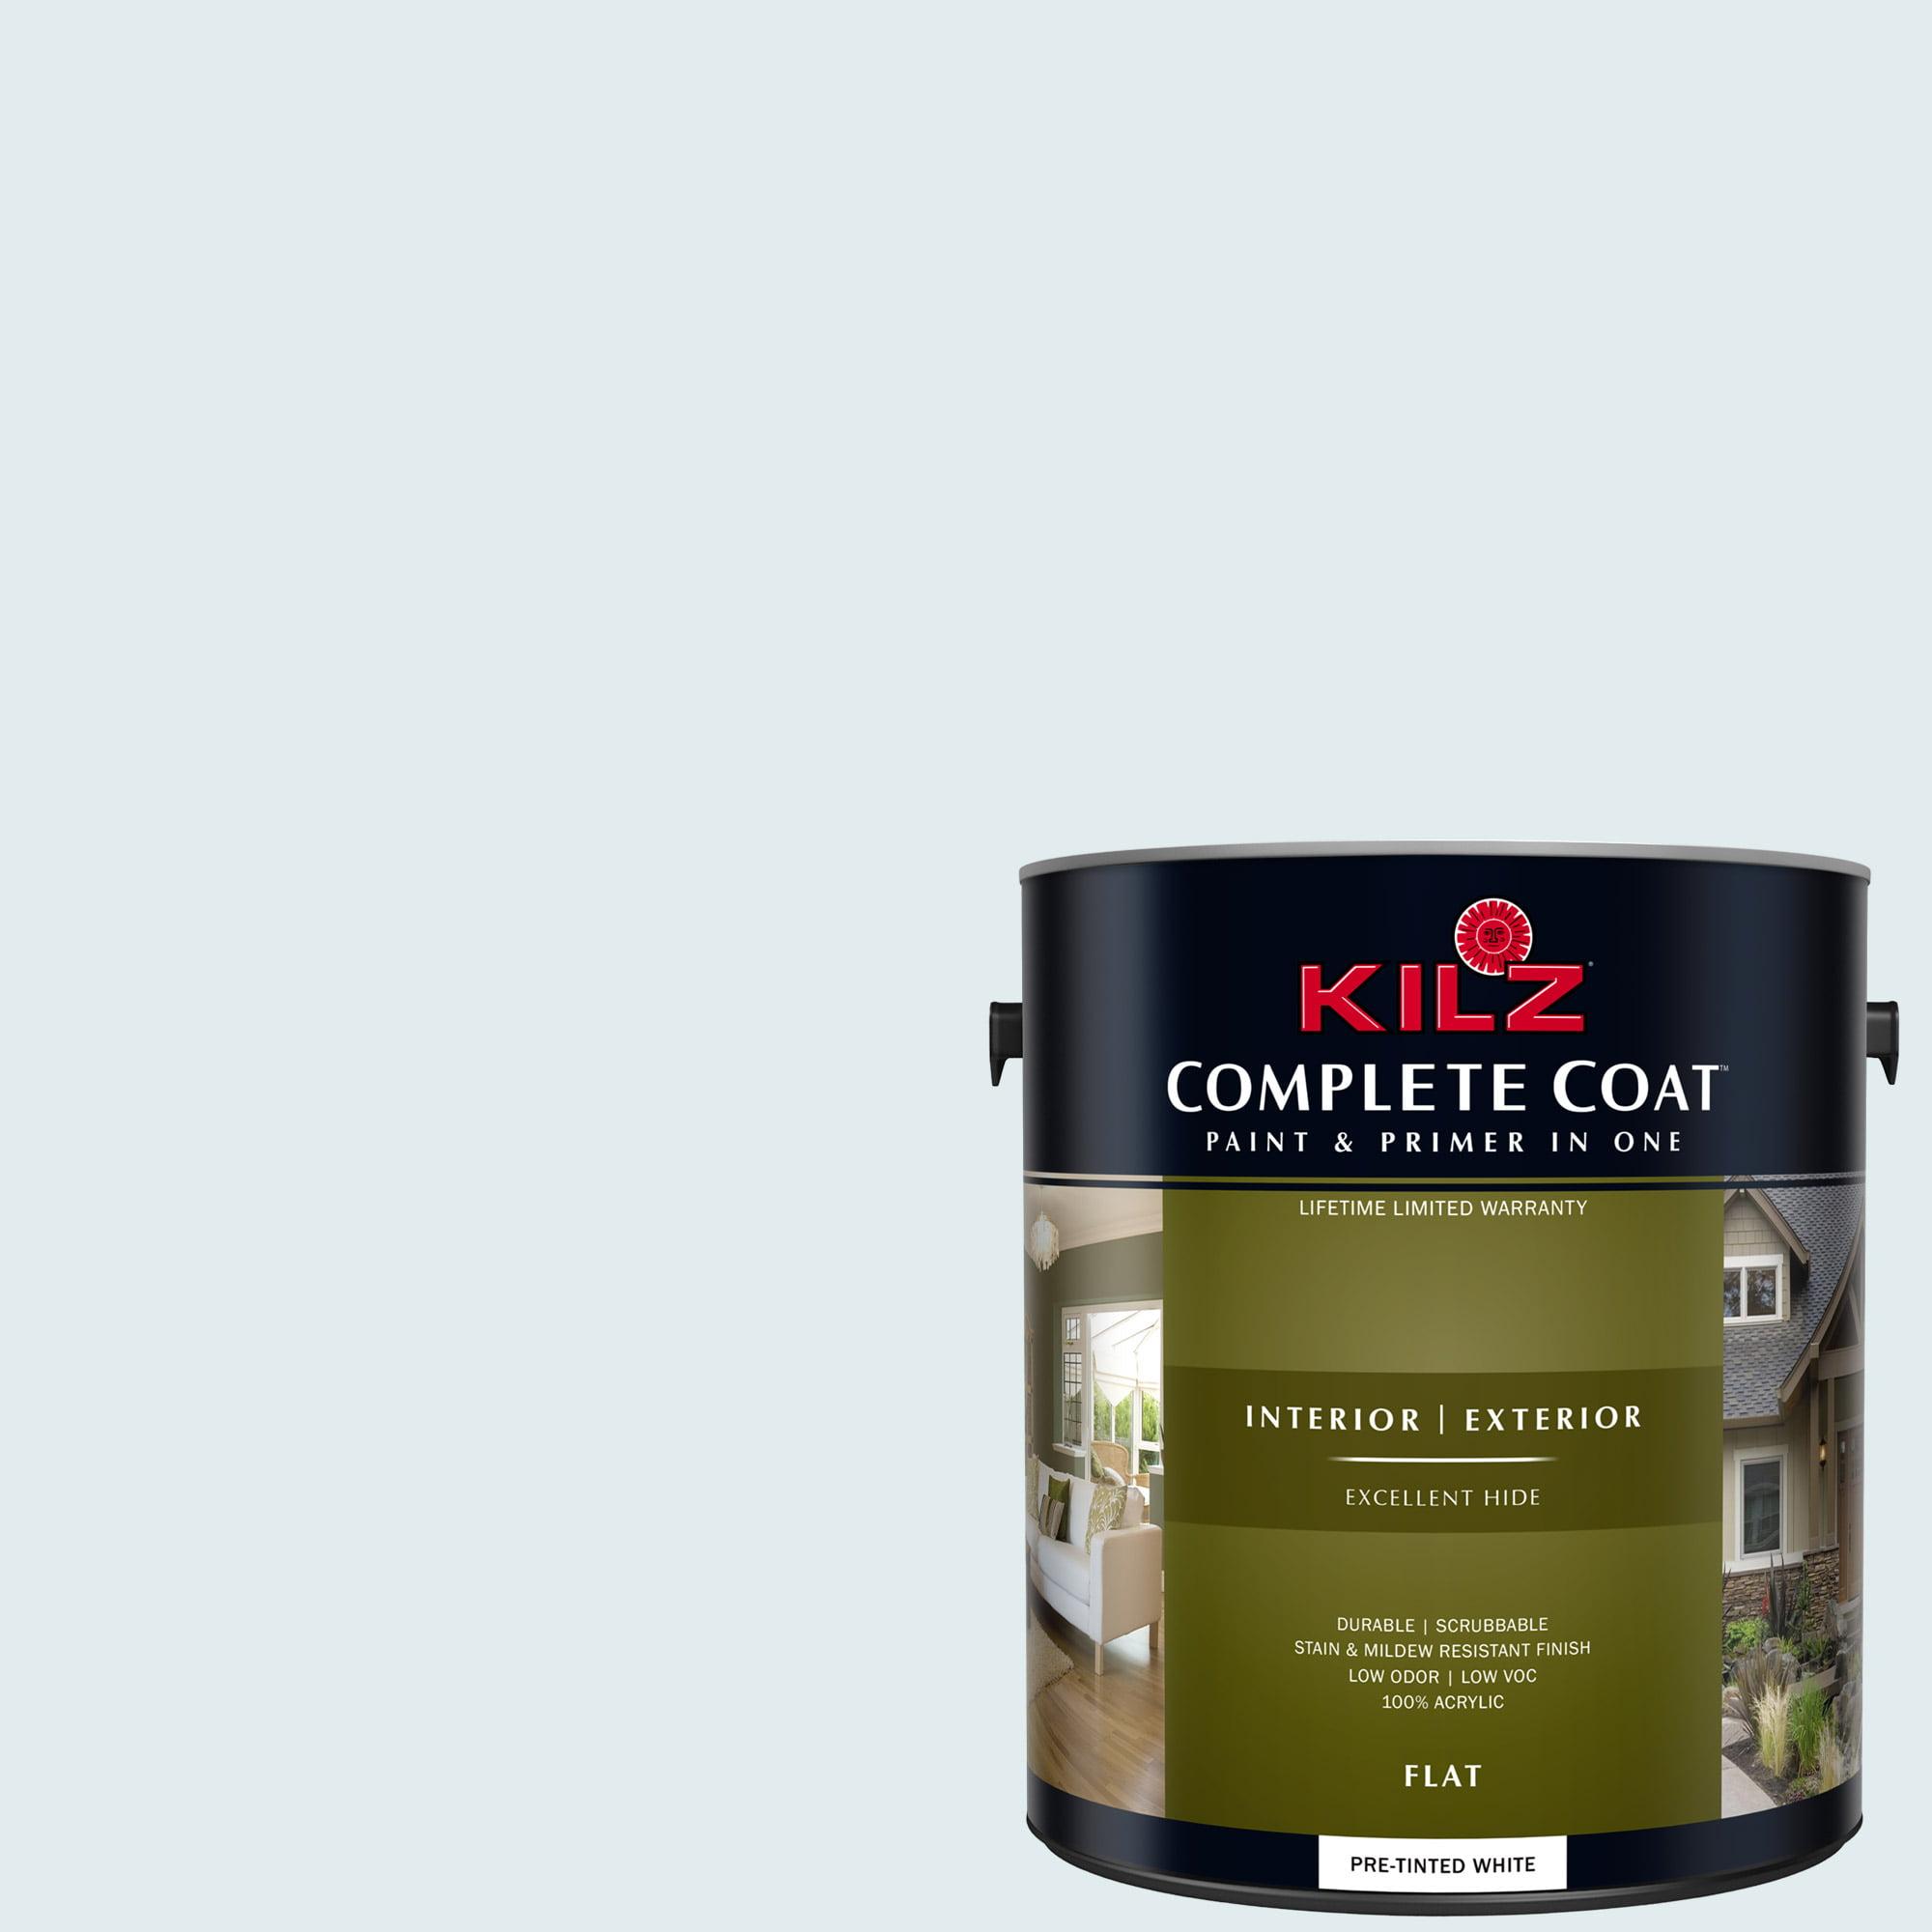 KILZ COMPLETE COAT Interior/Exterior Paint & Primer in One #RE190-01 Morning Hush